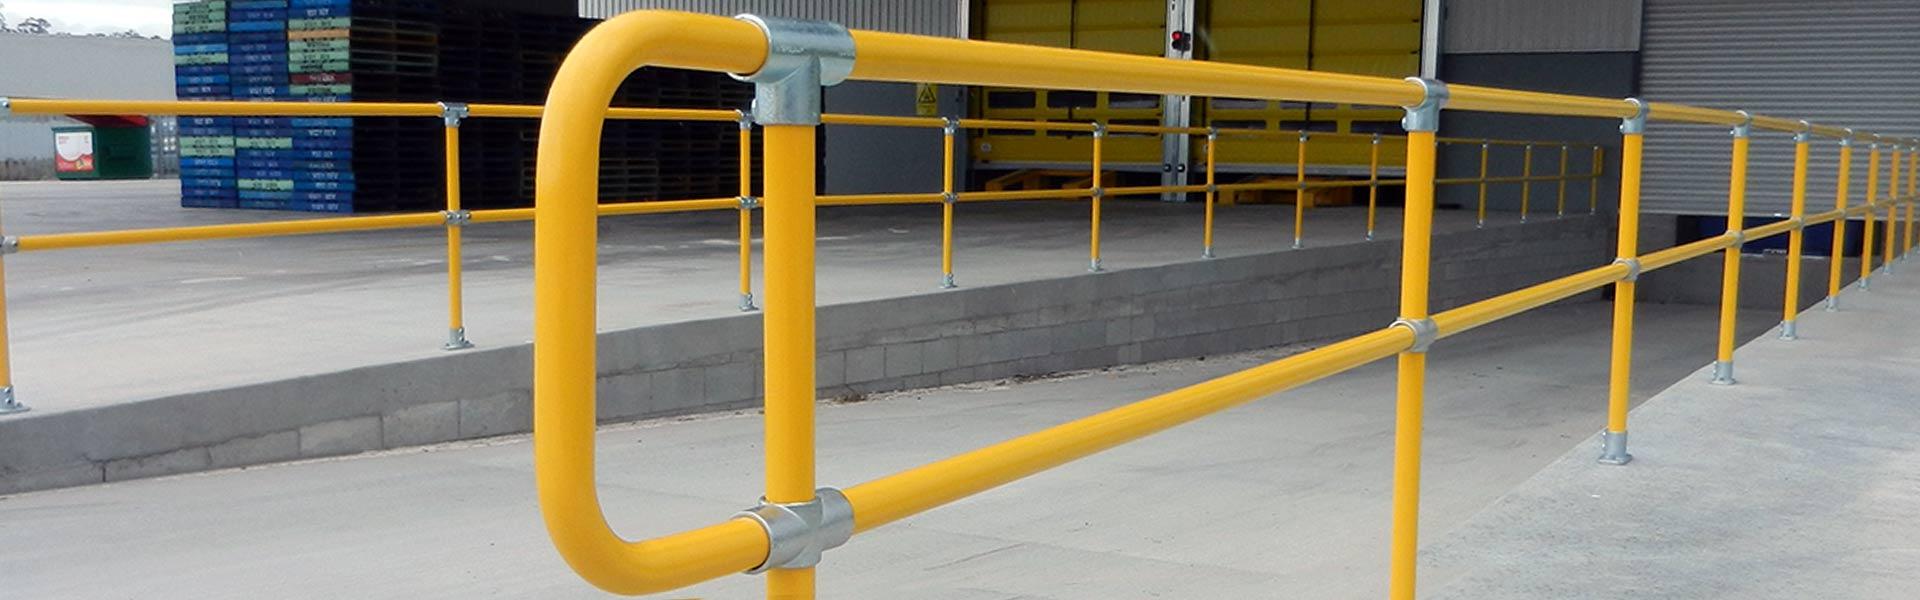 Key clamp store galvanised handrail fittings